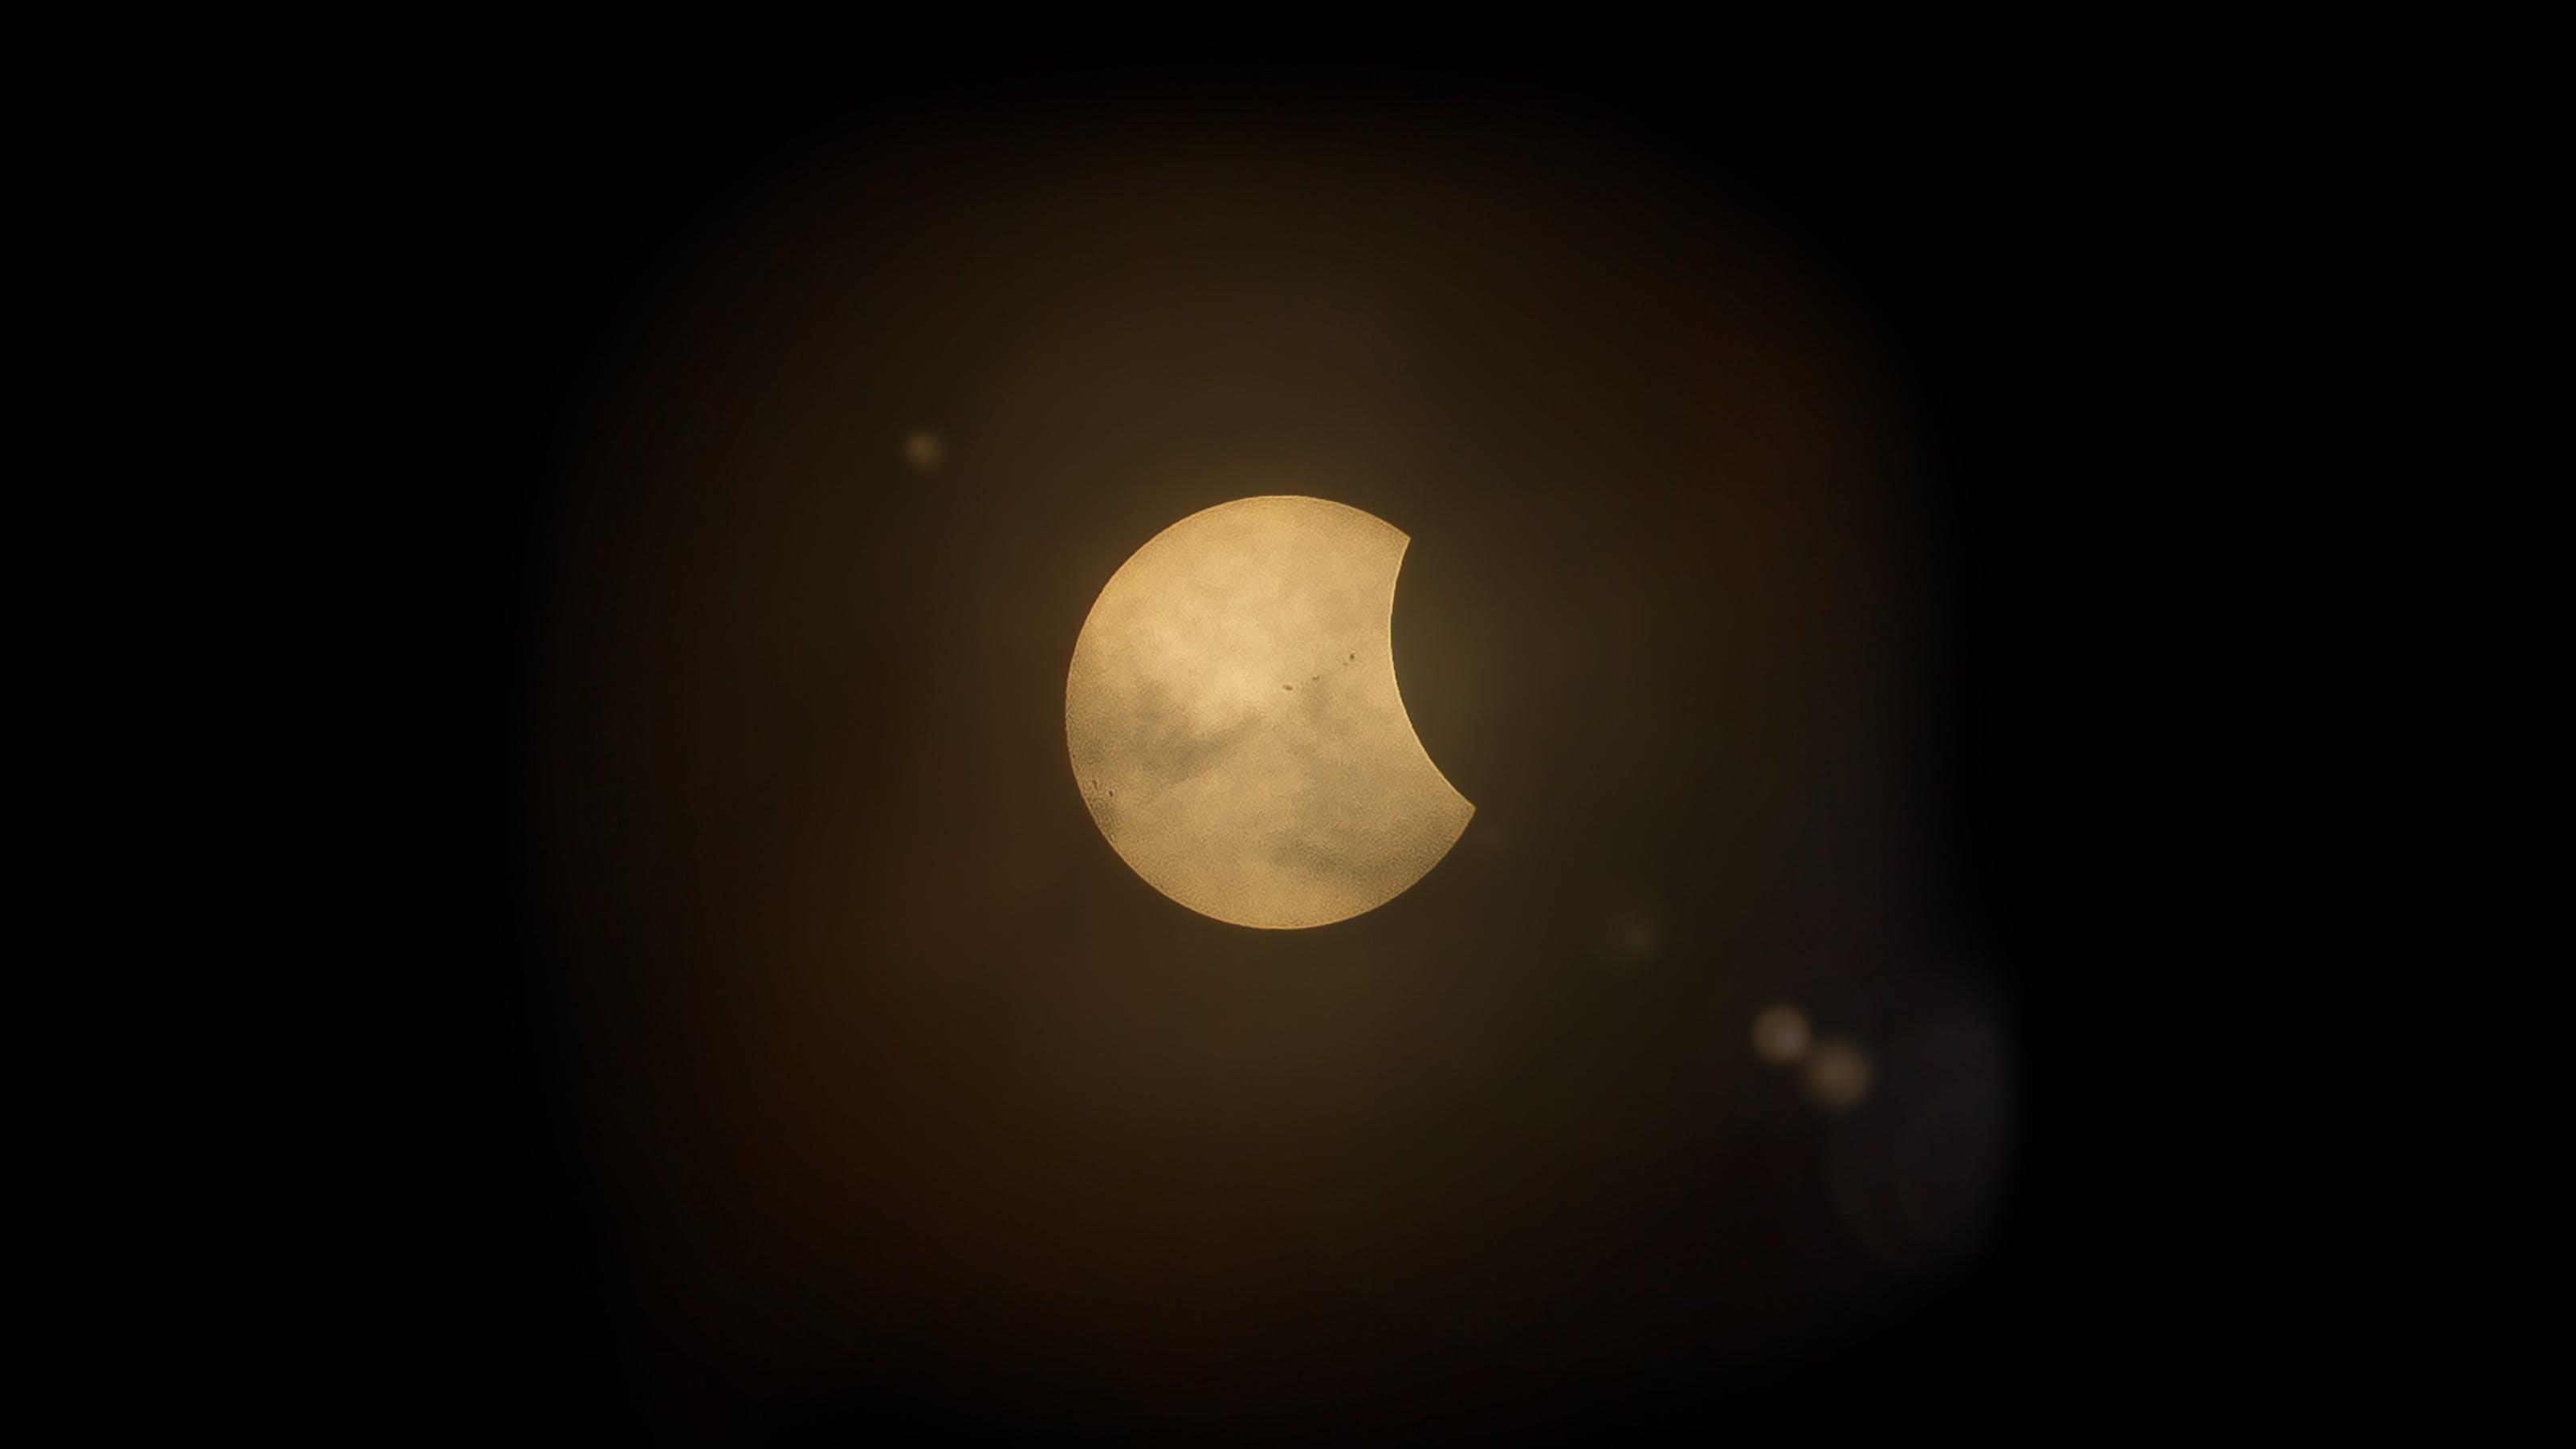 Free stock photo of night, space, dark, circle